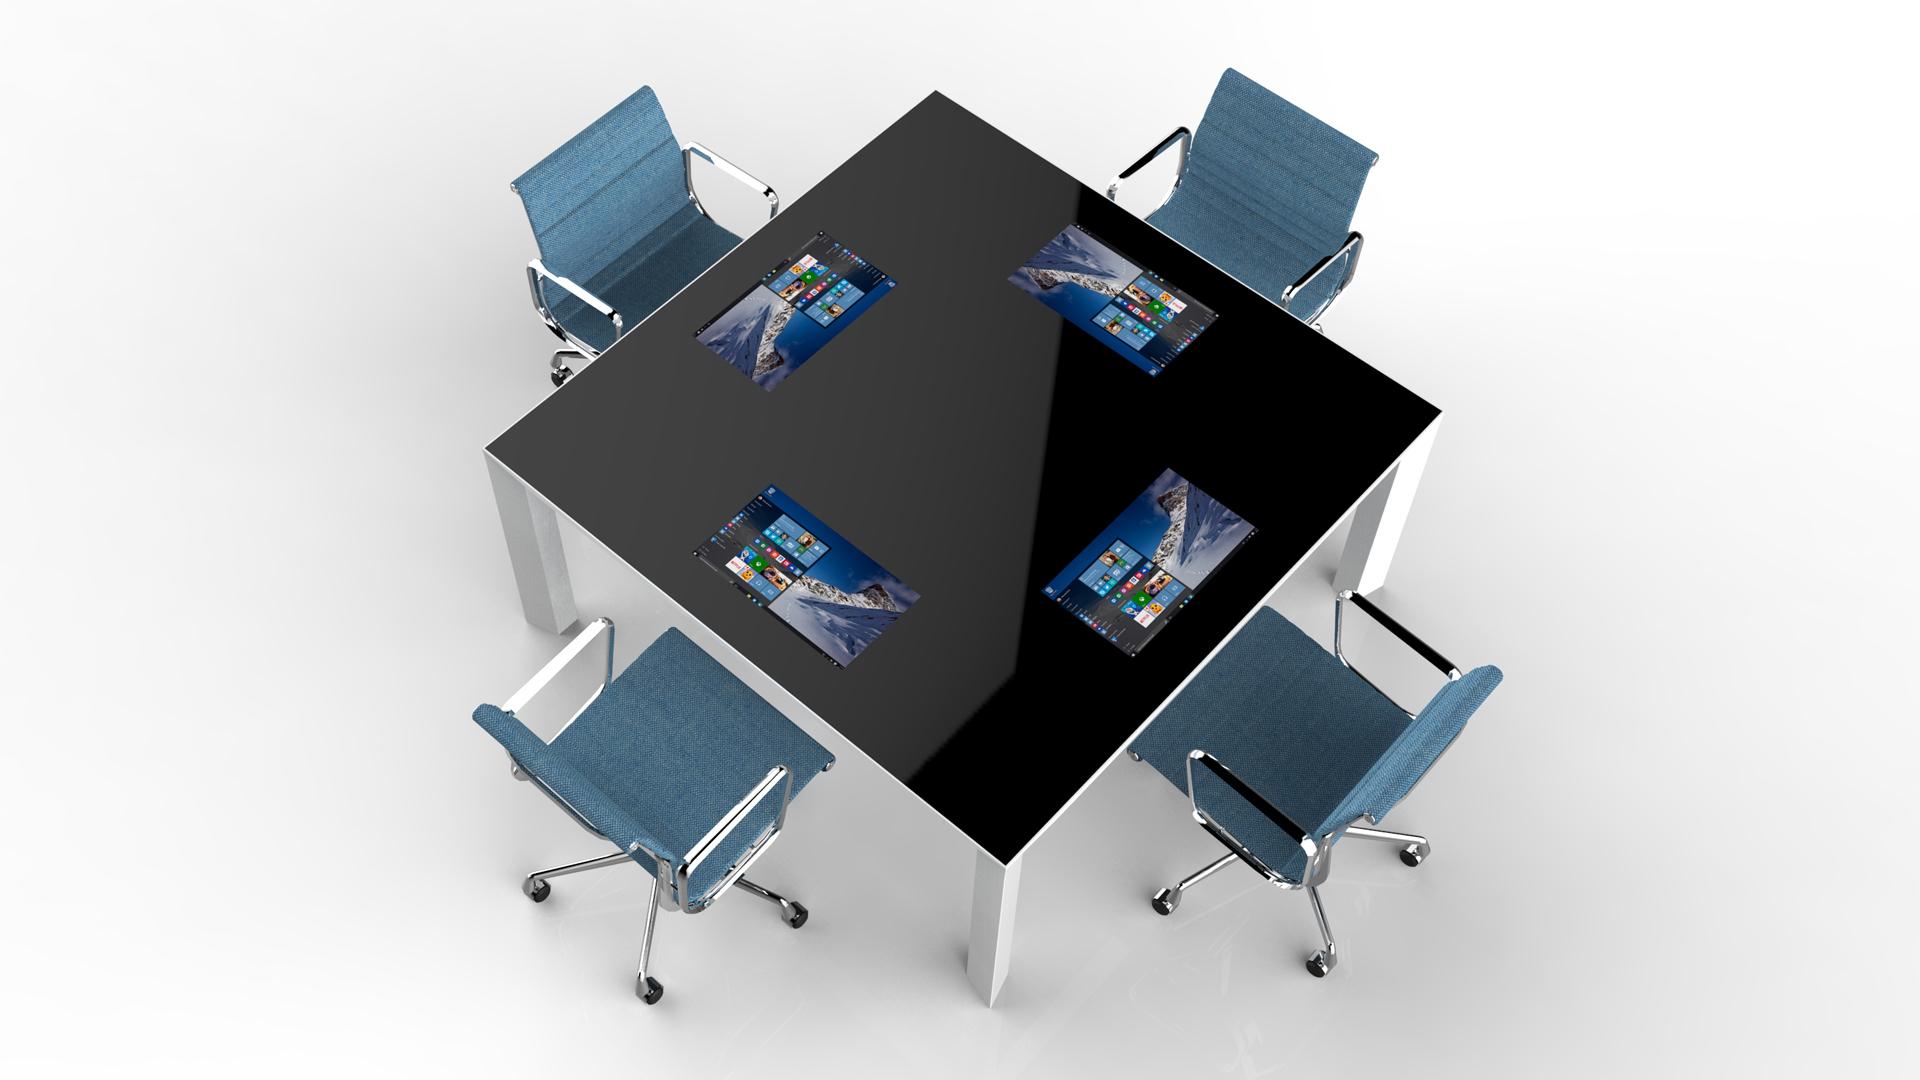 kite-smart-desk-level-office-landscape-re-mago